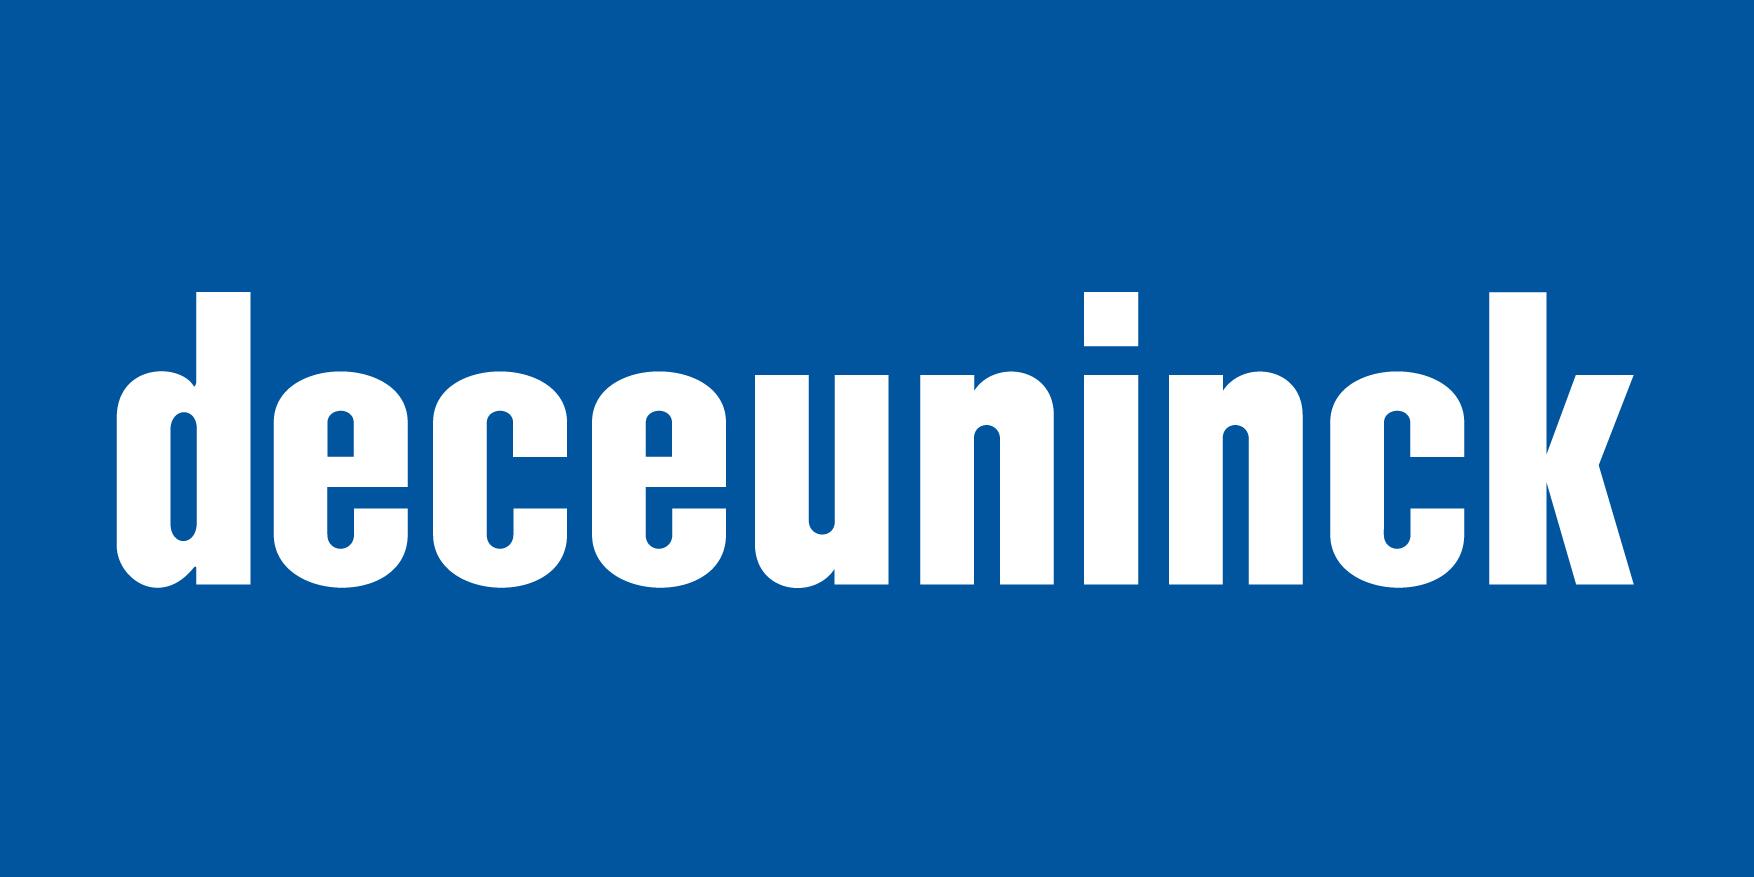 Deceuninck GmbH